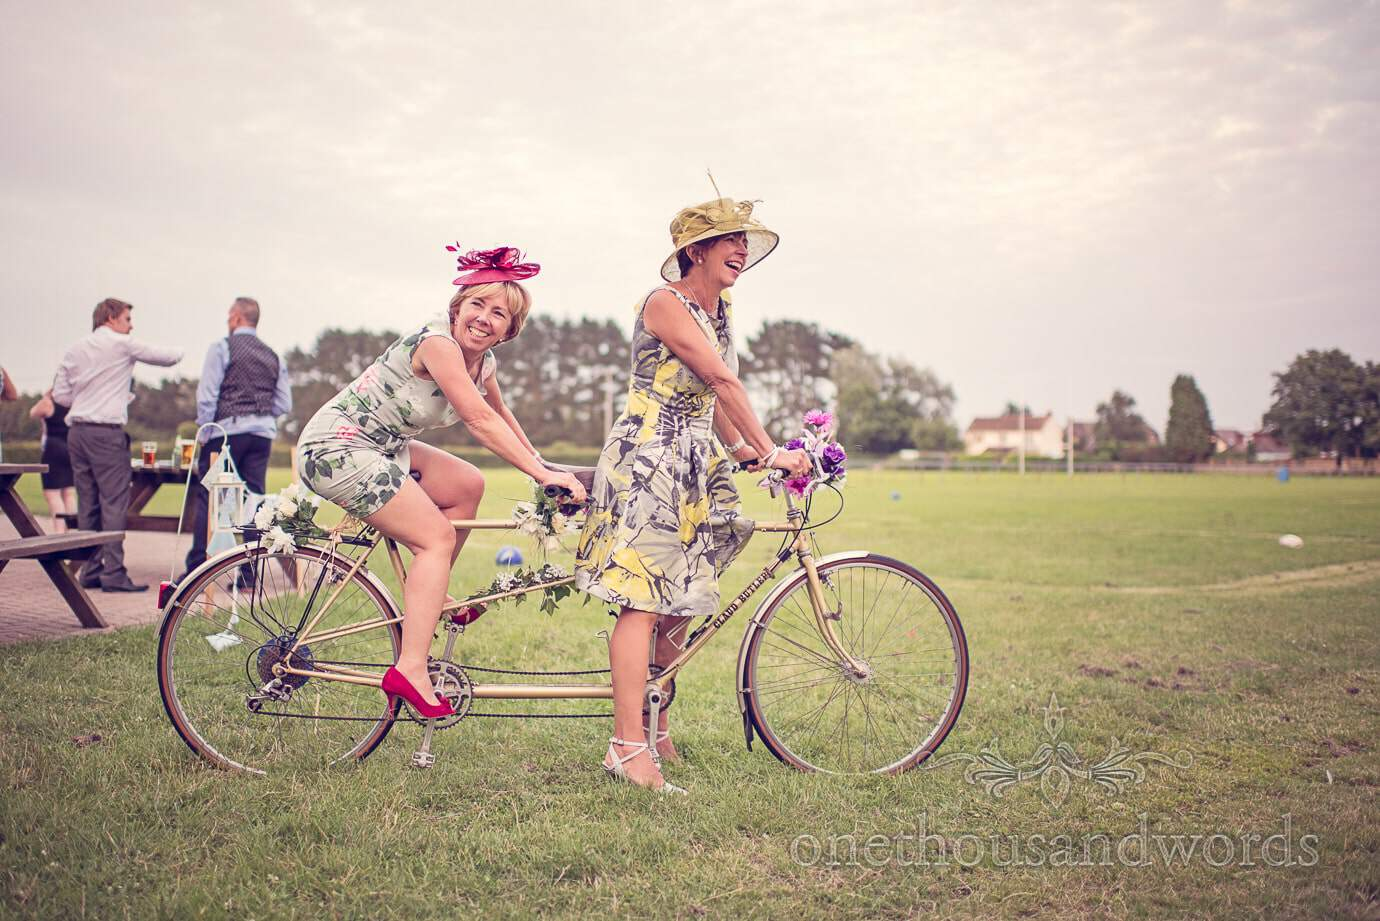 Happy wedding guests ride tandem wedding bike at Wareham Rugby Club